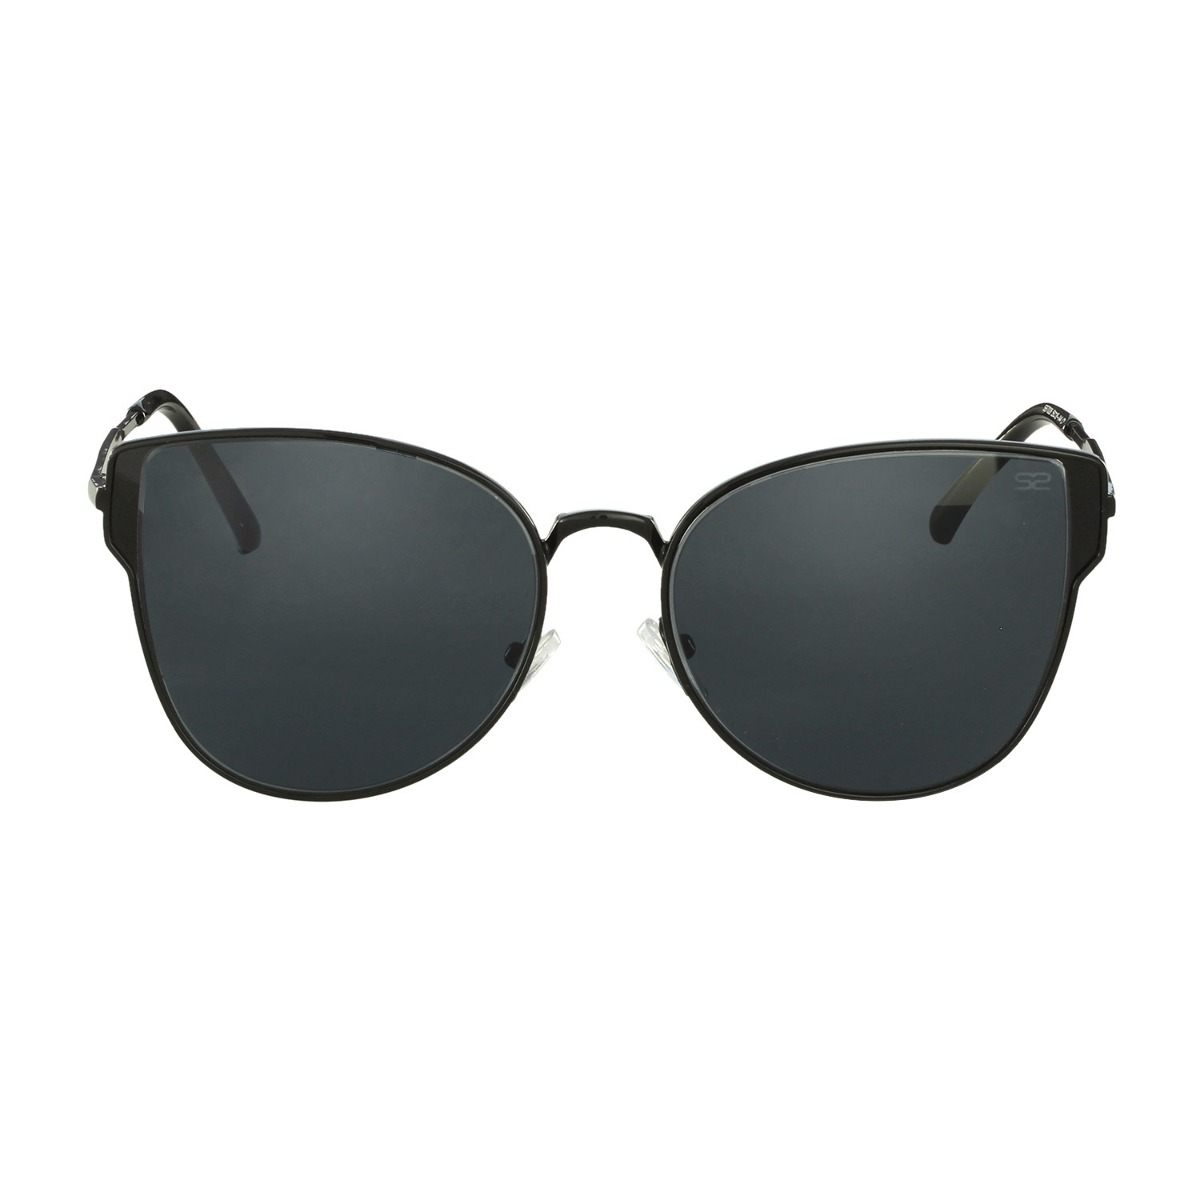 a1bd187fbab09 Óculos De Sol Sabrina Sato Fashion Preto Sb7008c1 - R  350,00 em ...